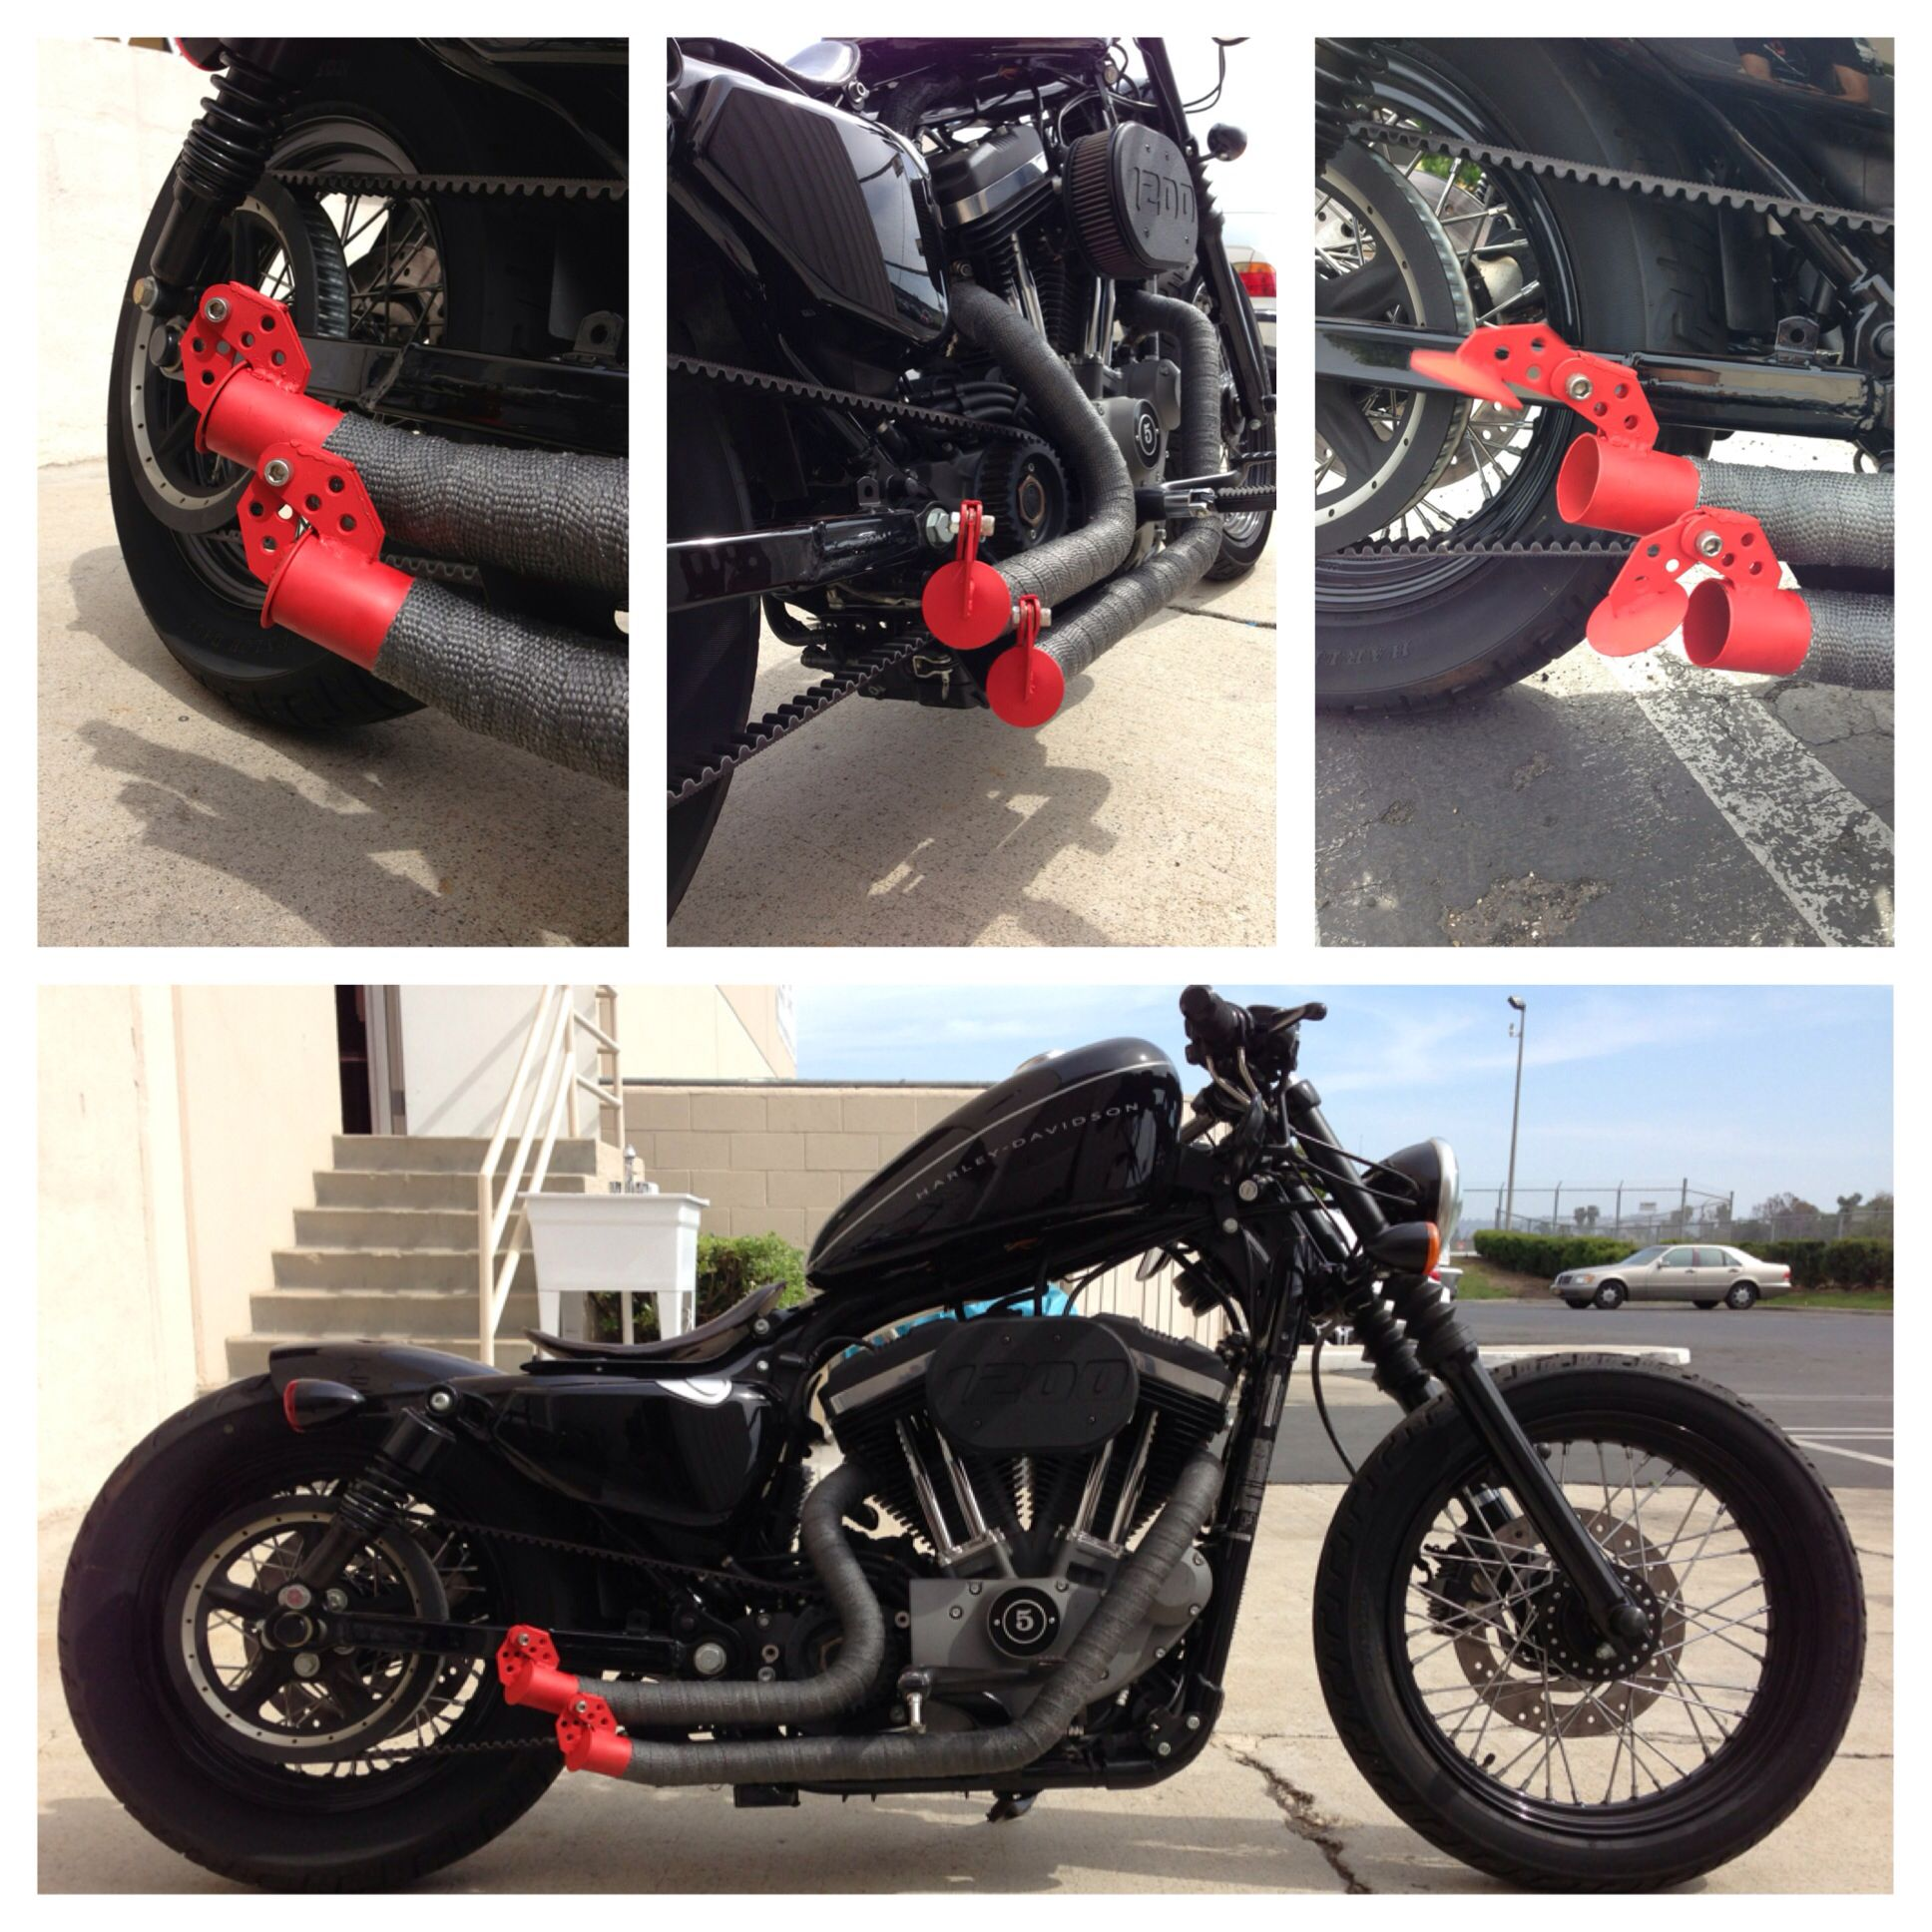 Flapper exhaust on Harley Davidson Nightster bobber